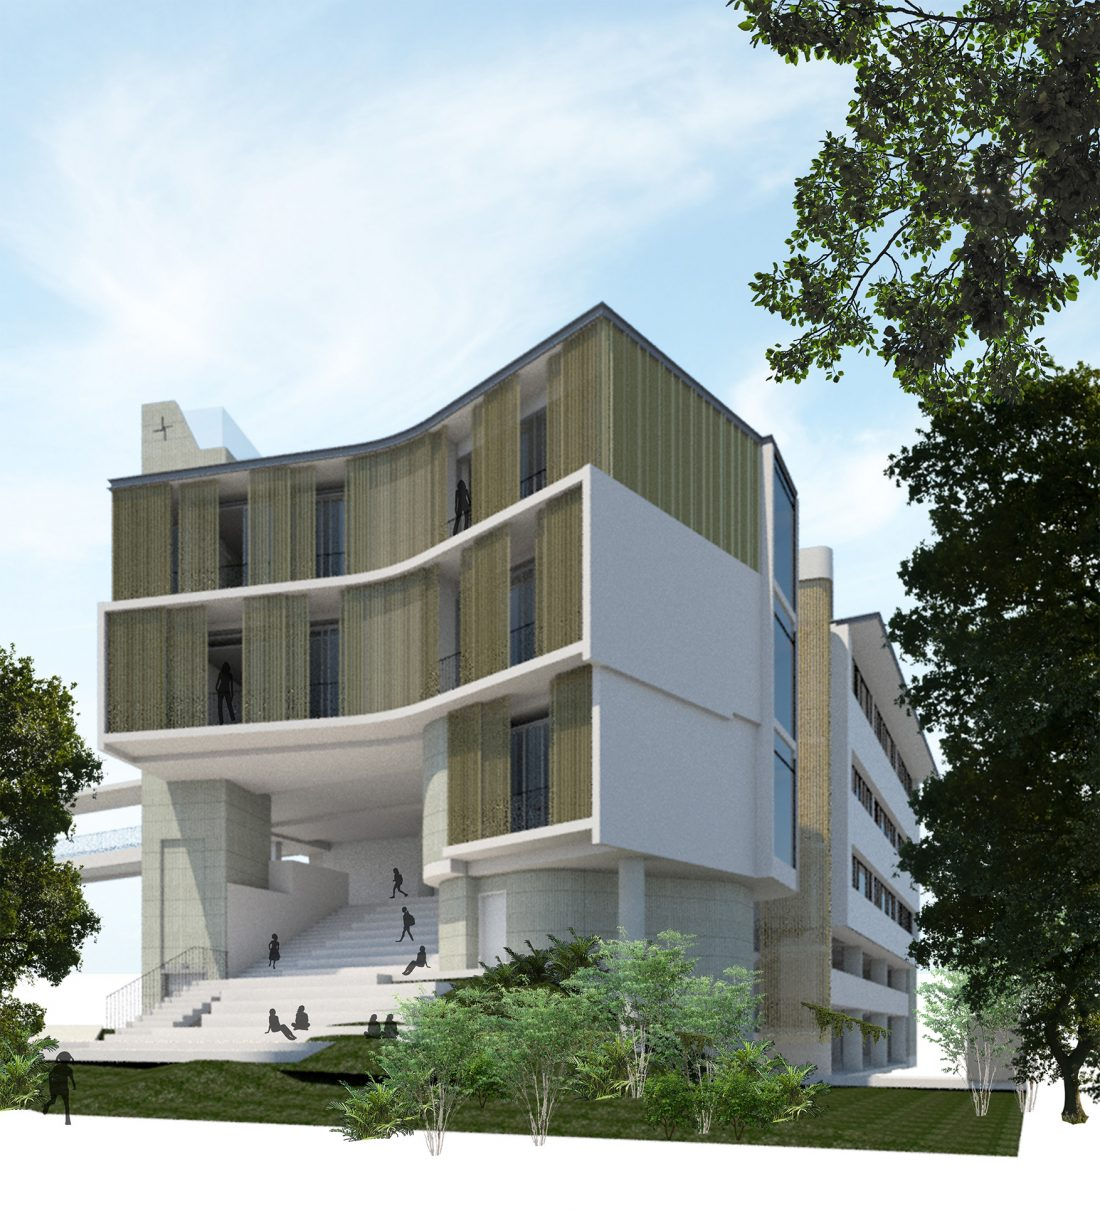 BRIGIDINE COLLEGE - NEW TECHNOLOGY BUILDING